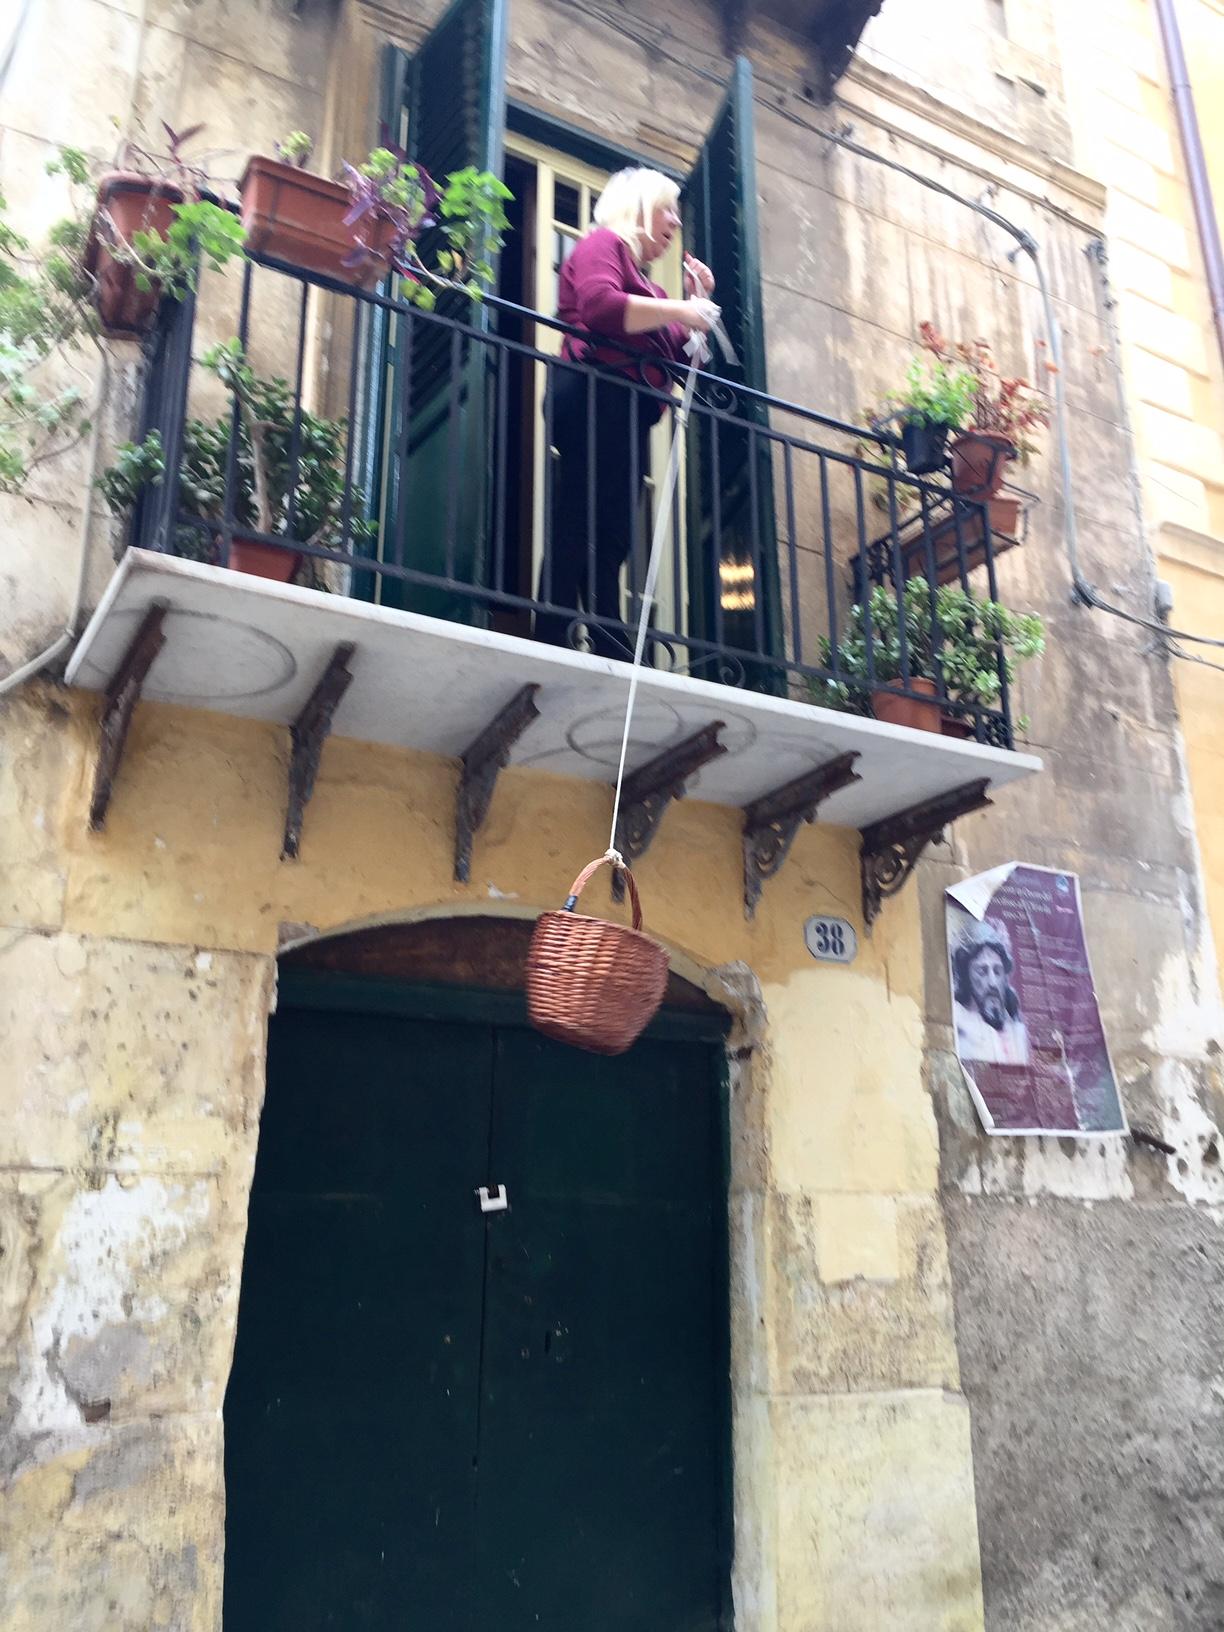 Italy-Sicily-street-scene-Powerful-Goddess-Portraits